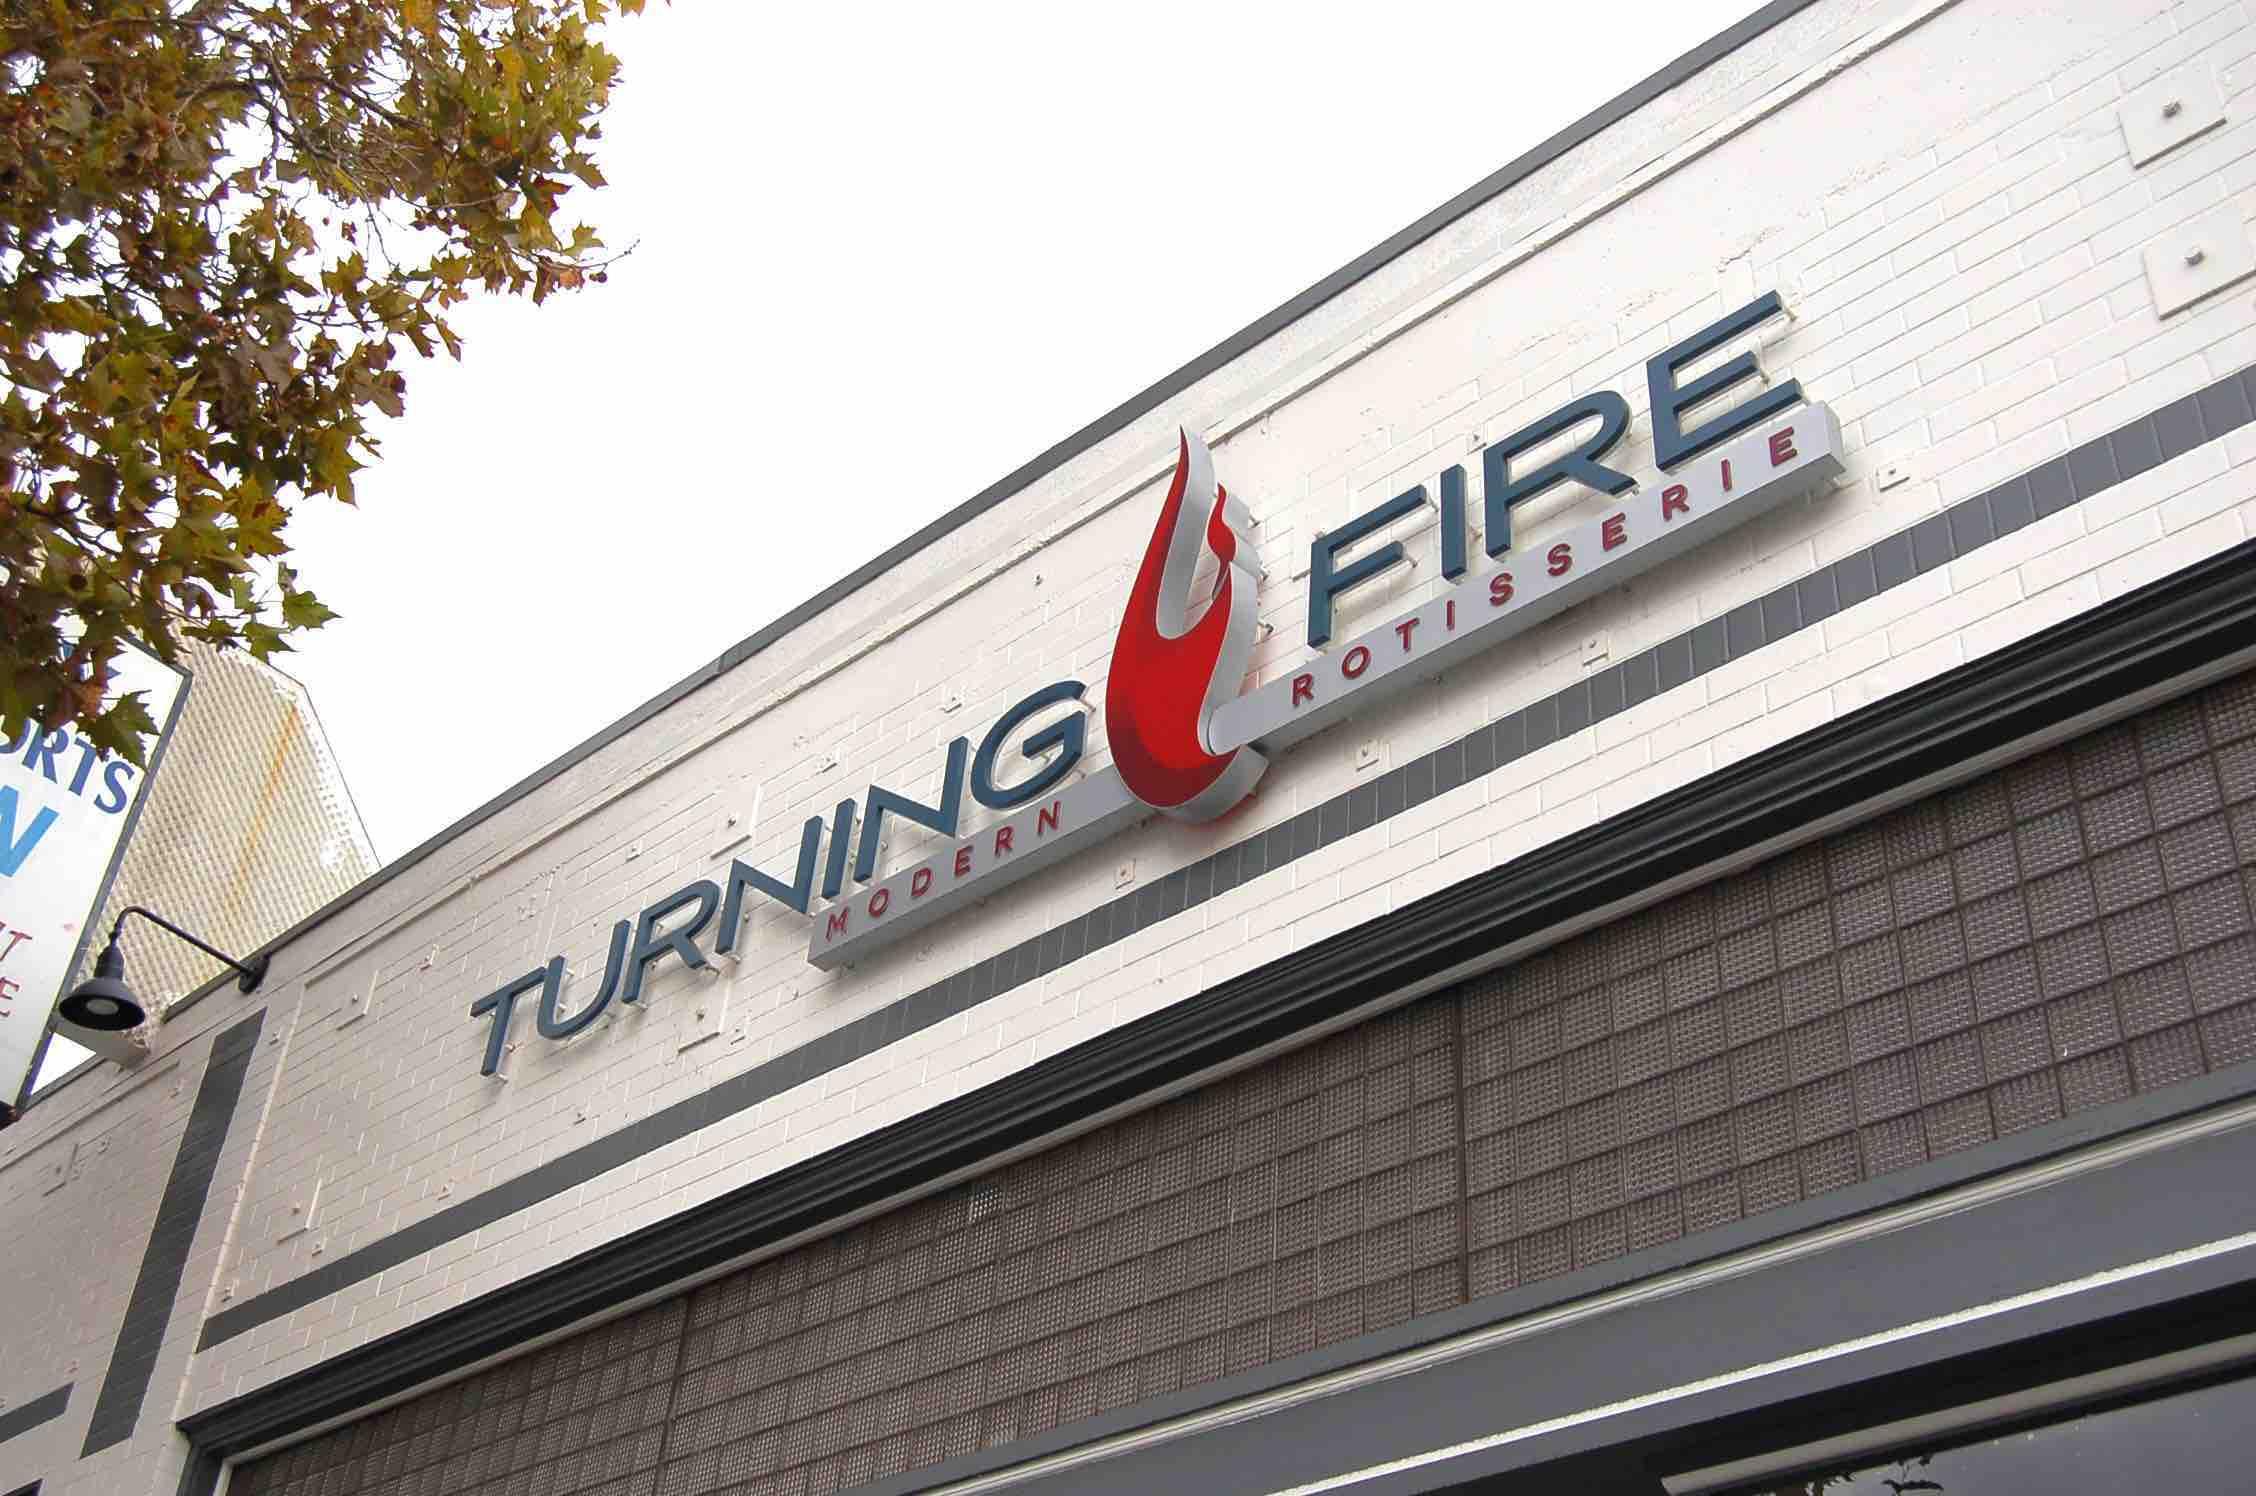 Turningfire Modern Rotisserie Eagle Rock, CA